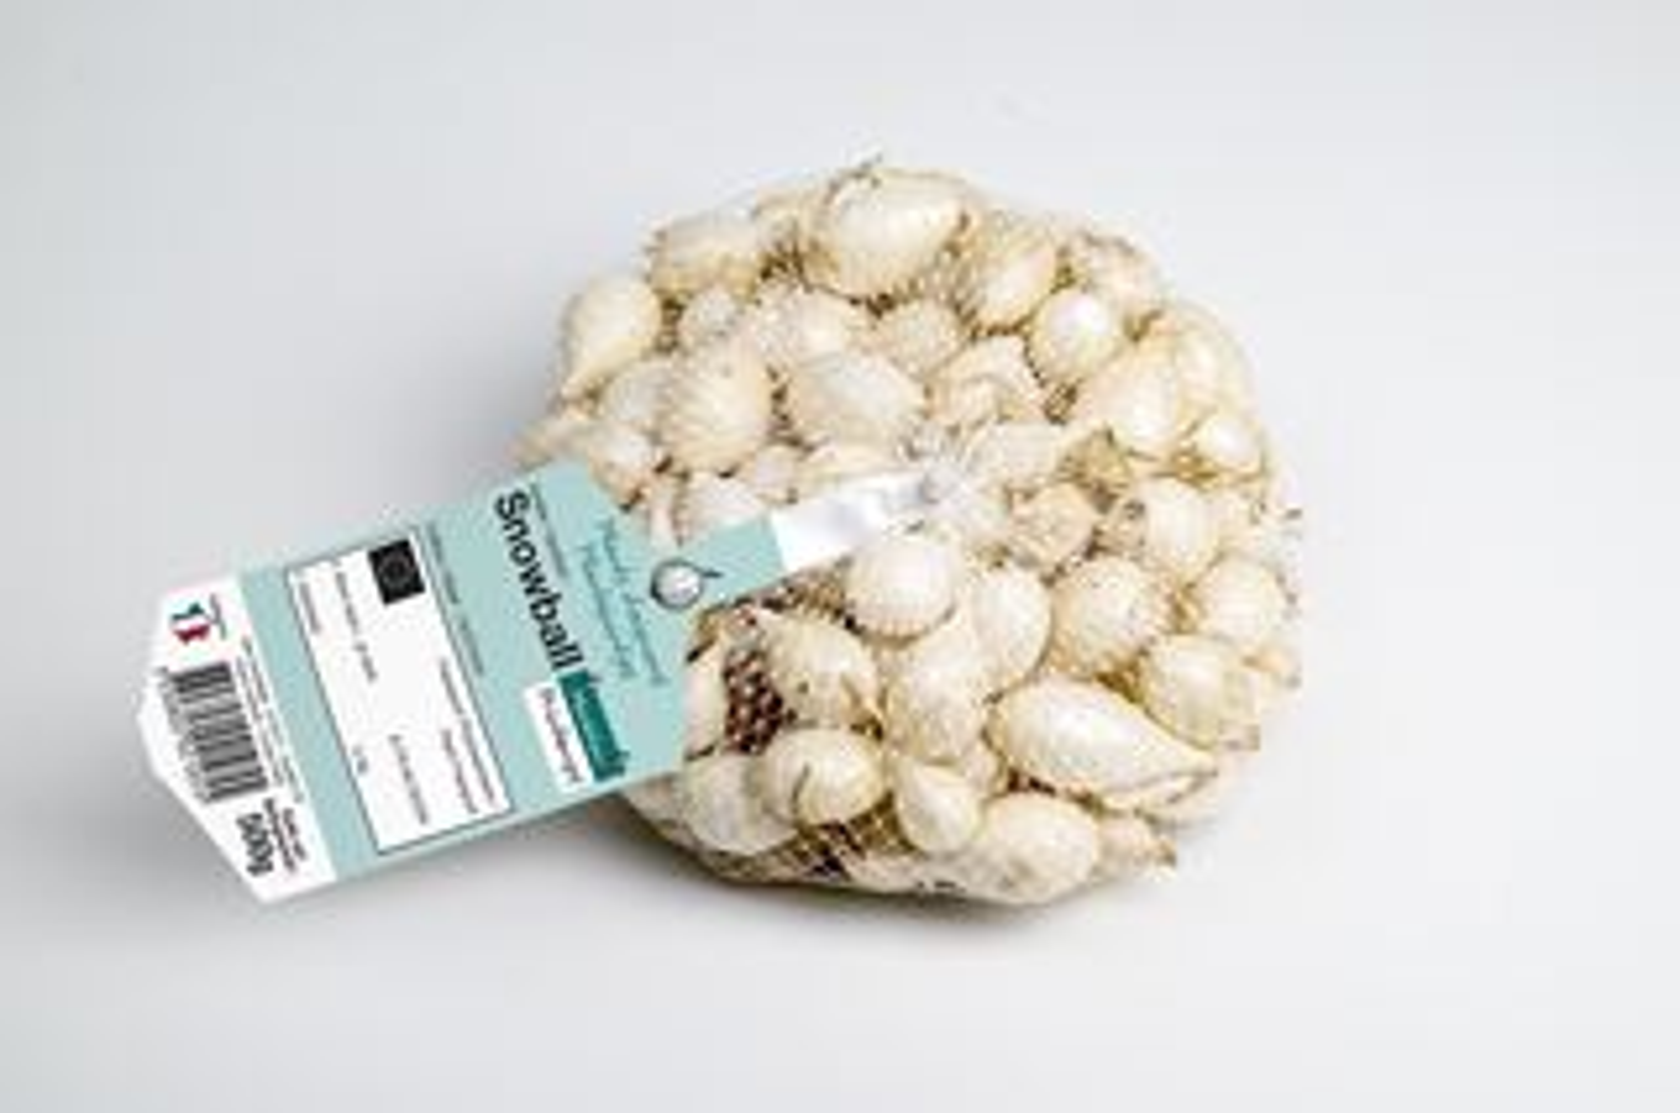 Plantajuin-Snowball-Wit-netje-500gr-14-21mm